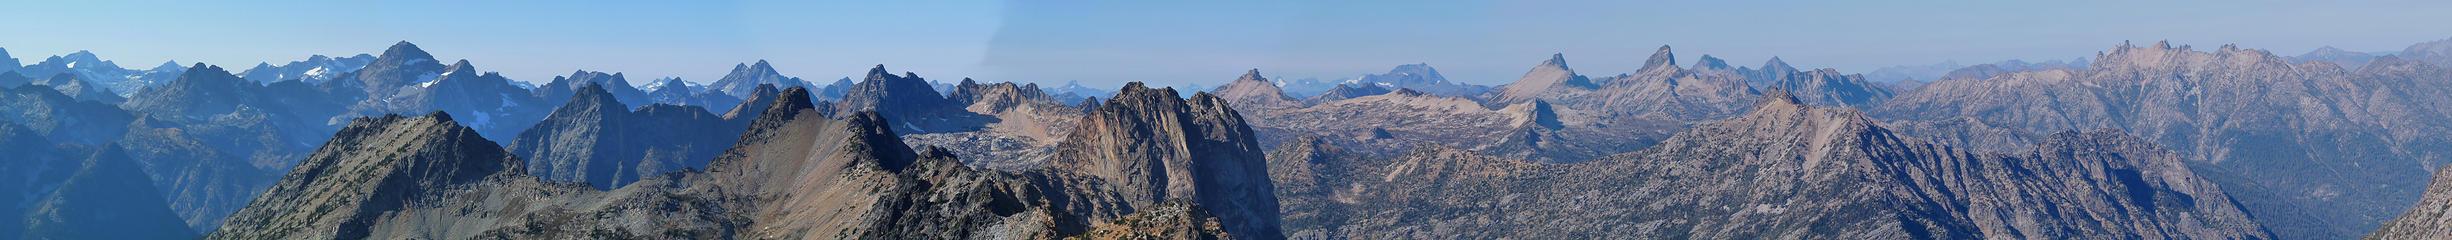 Large summit pano